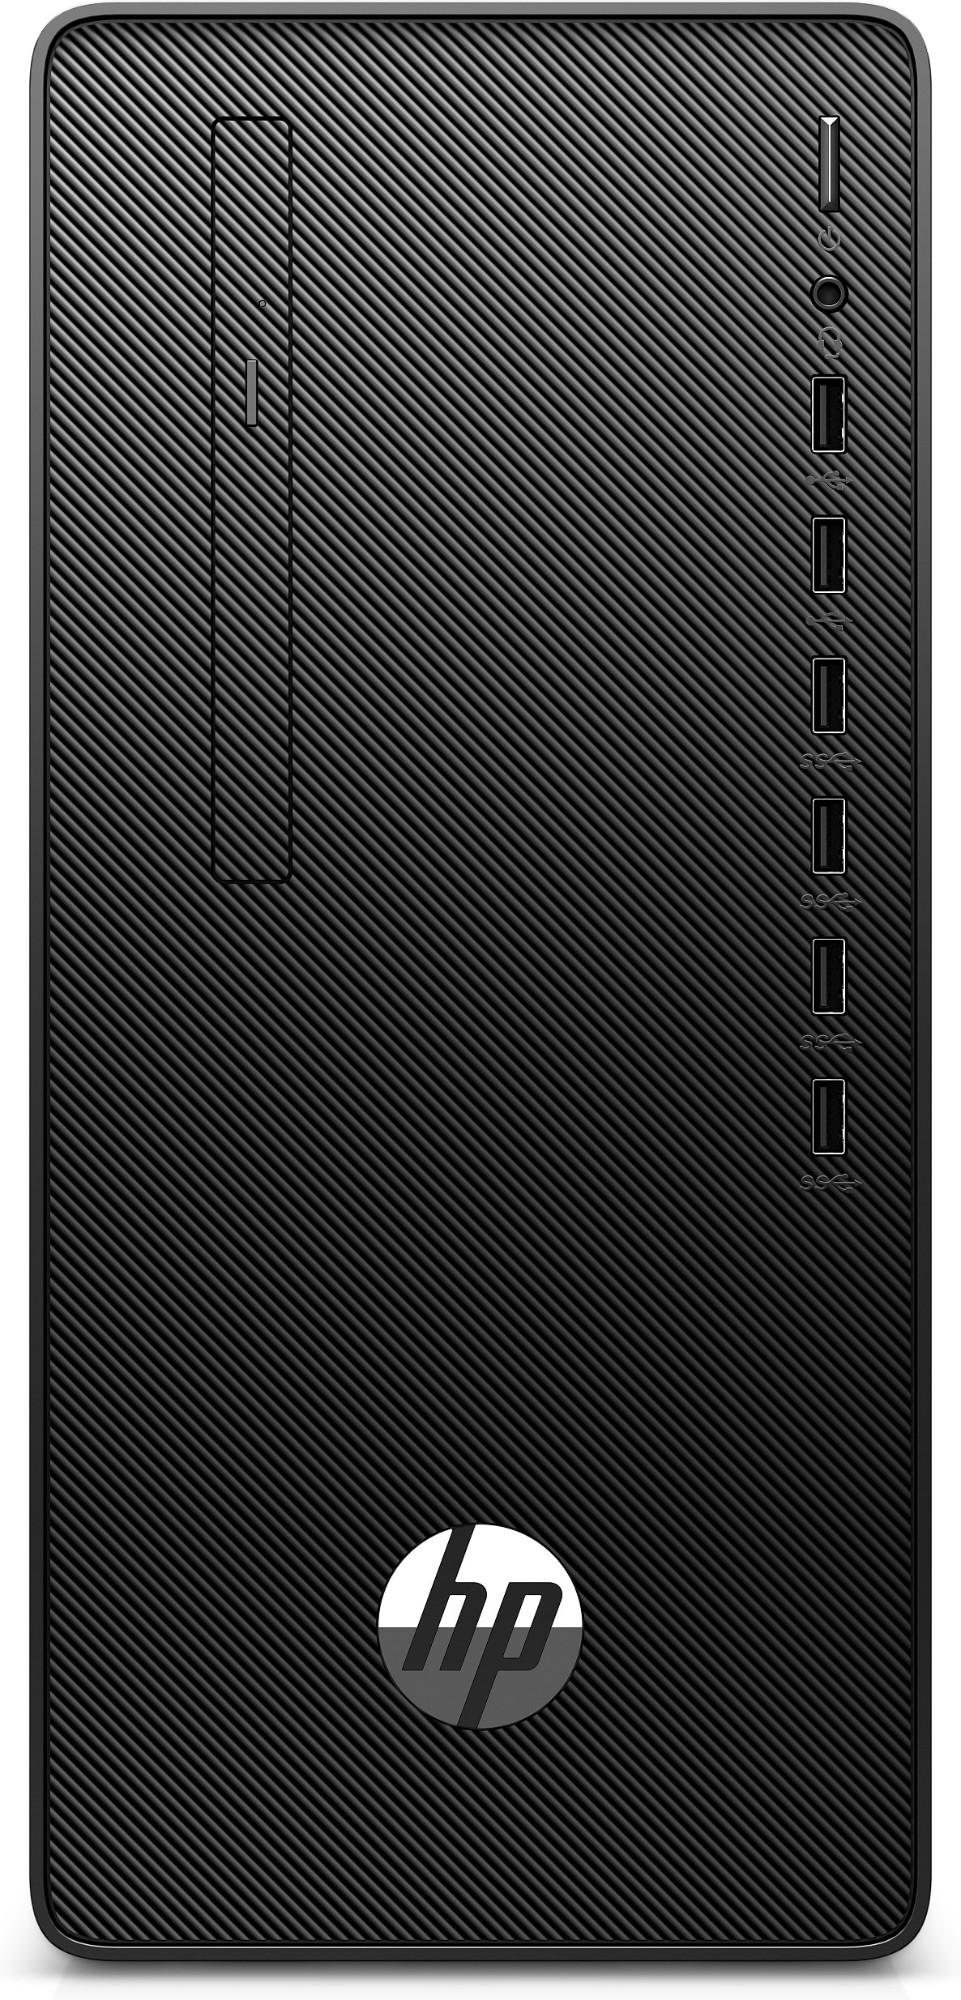 HP 295 G6 DDR4-SDRAM 3200G Micro Tower AMD Ryzen 3 PRO 8 GB 256 GB SSD Windows 10 Pro PC Black